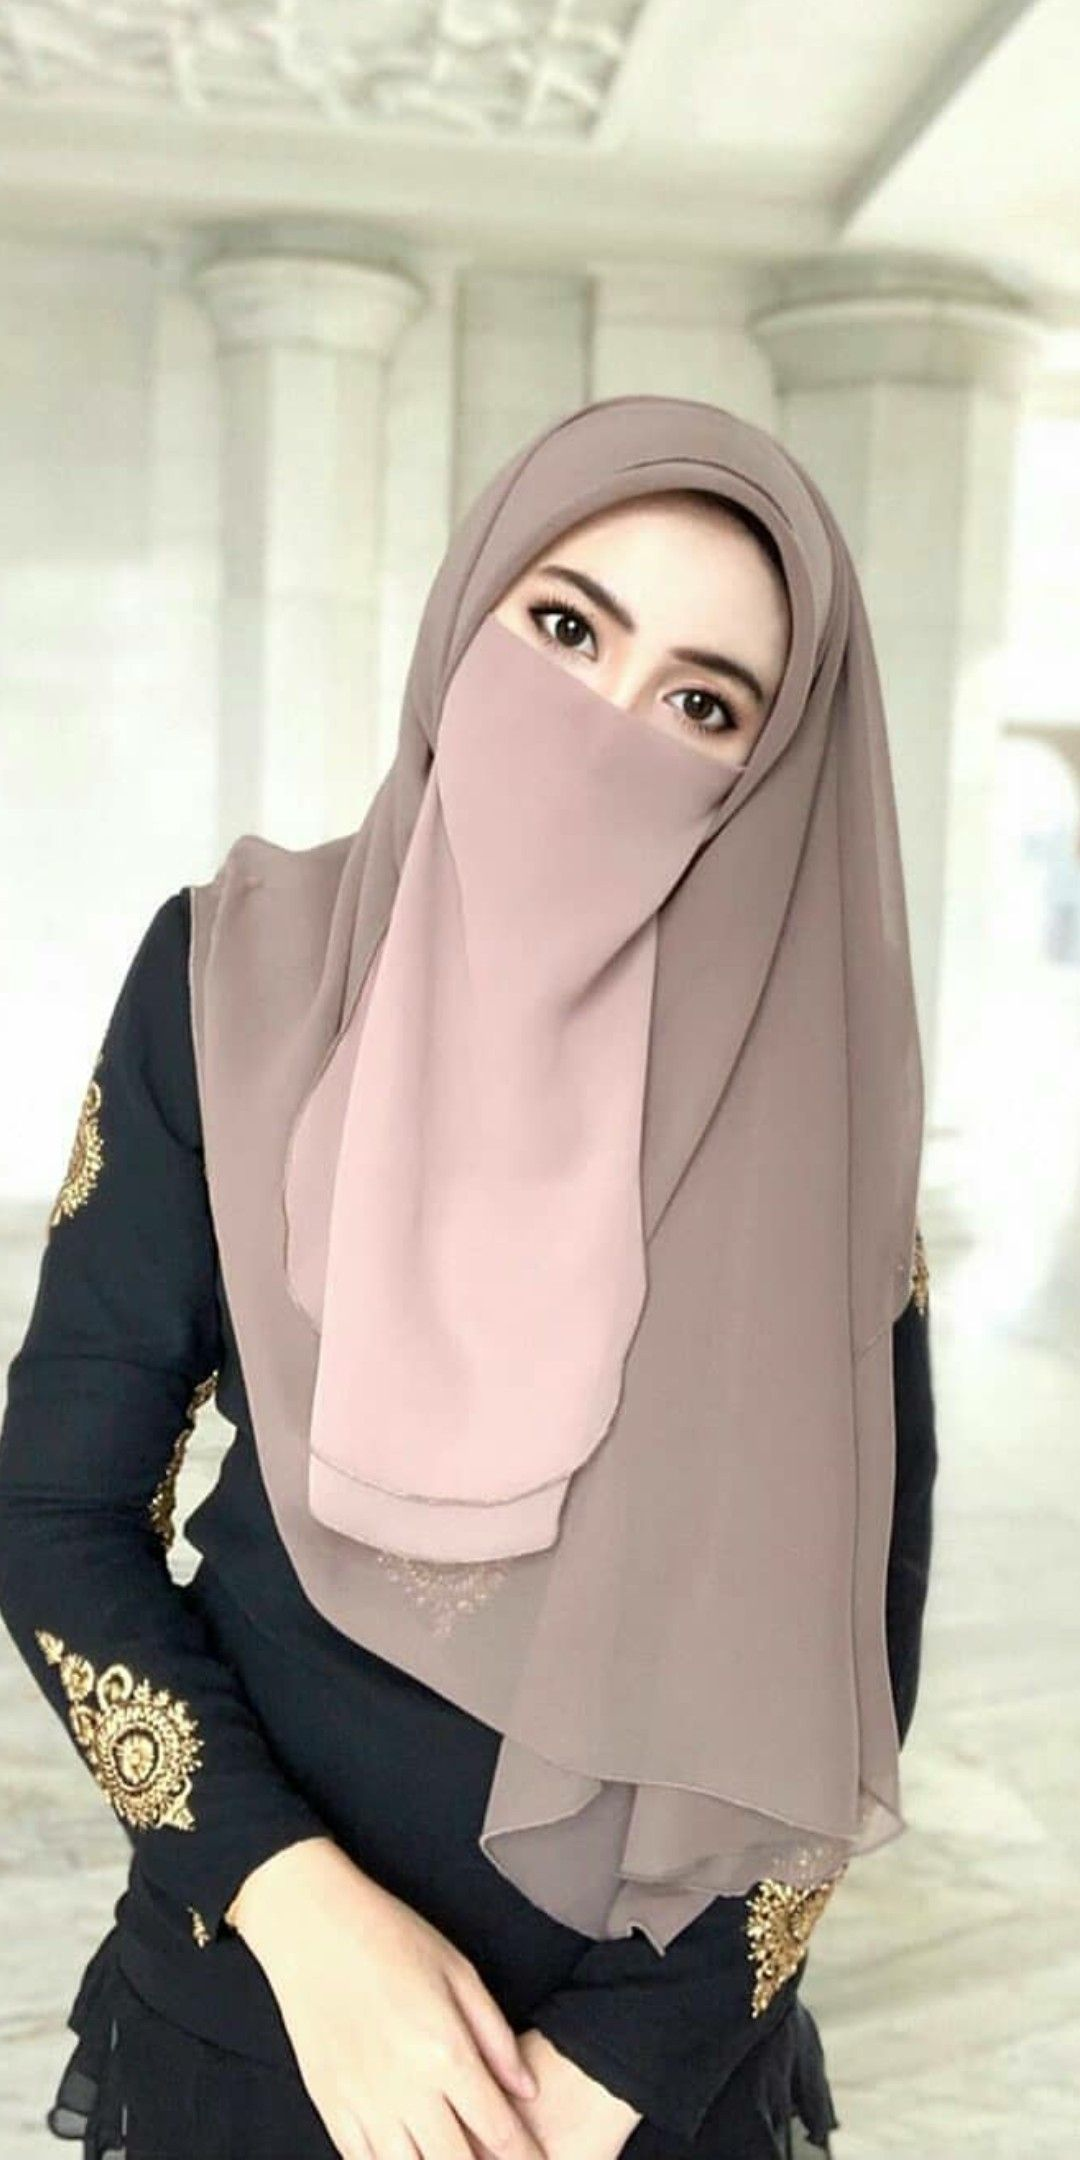 Pin Oleh Mahtabhasan Di Your Pinterest Likes Gaya Hijab Hijab Chic Model Pakaian Hijab